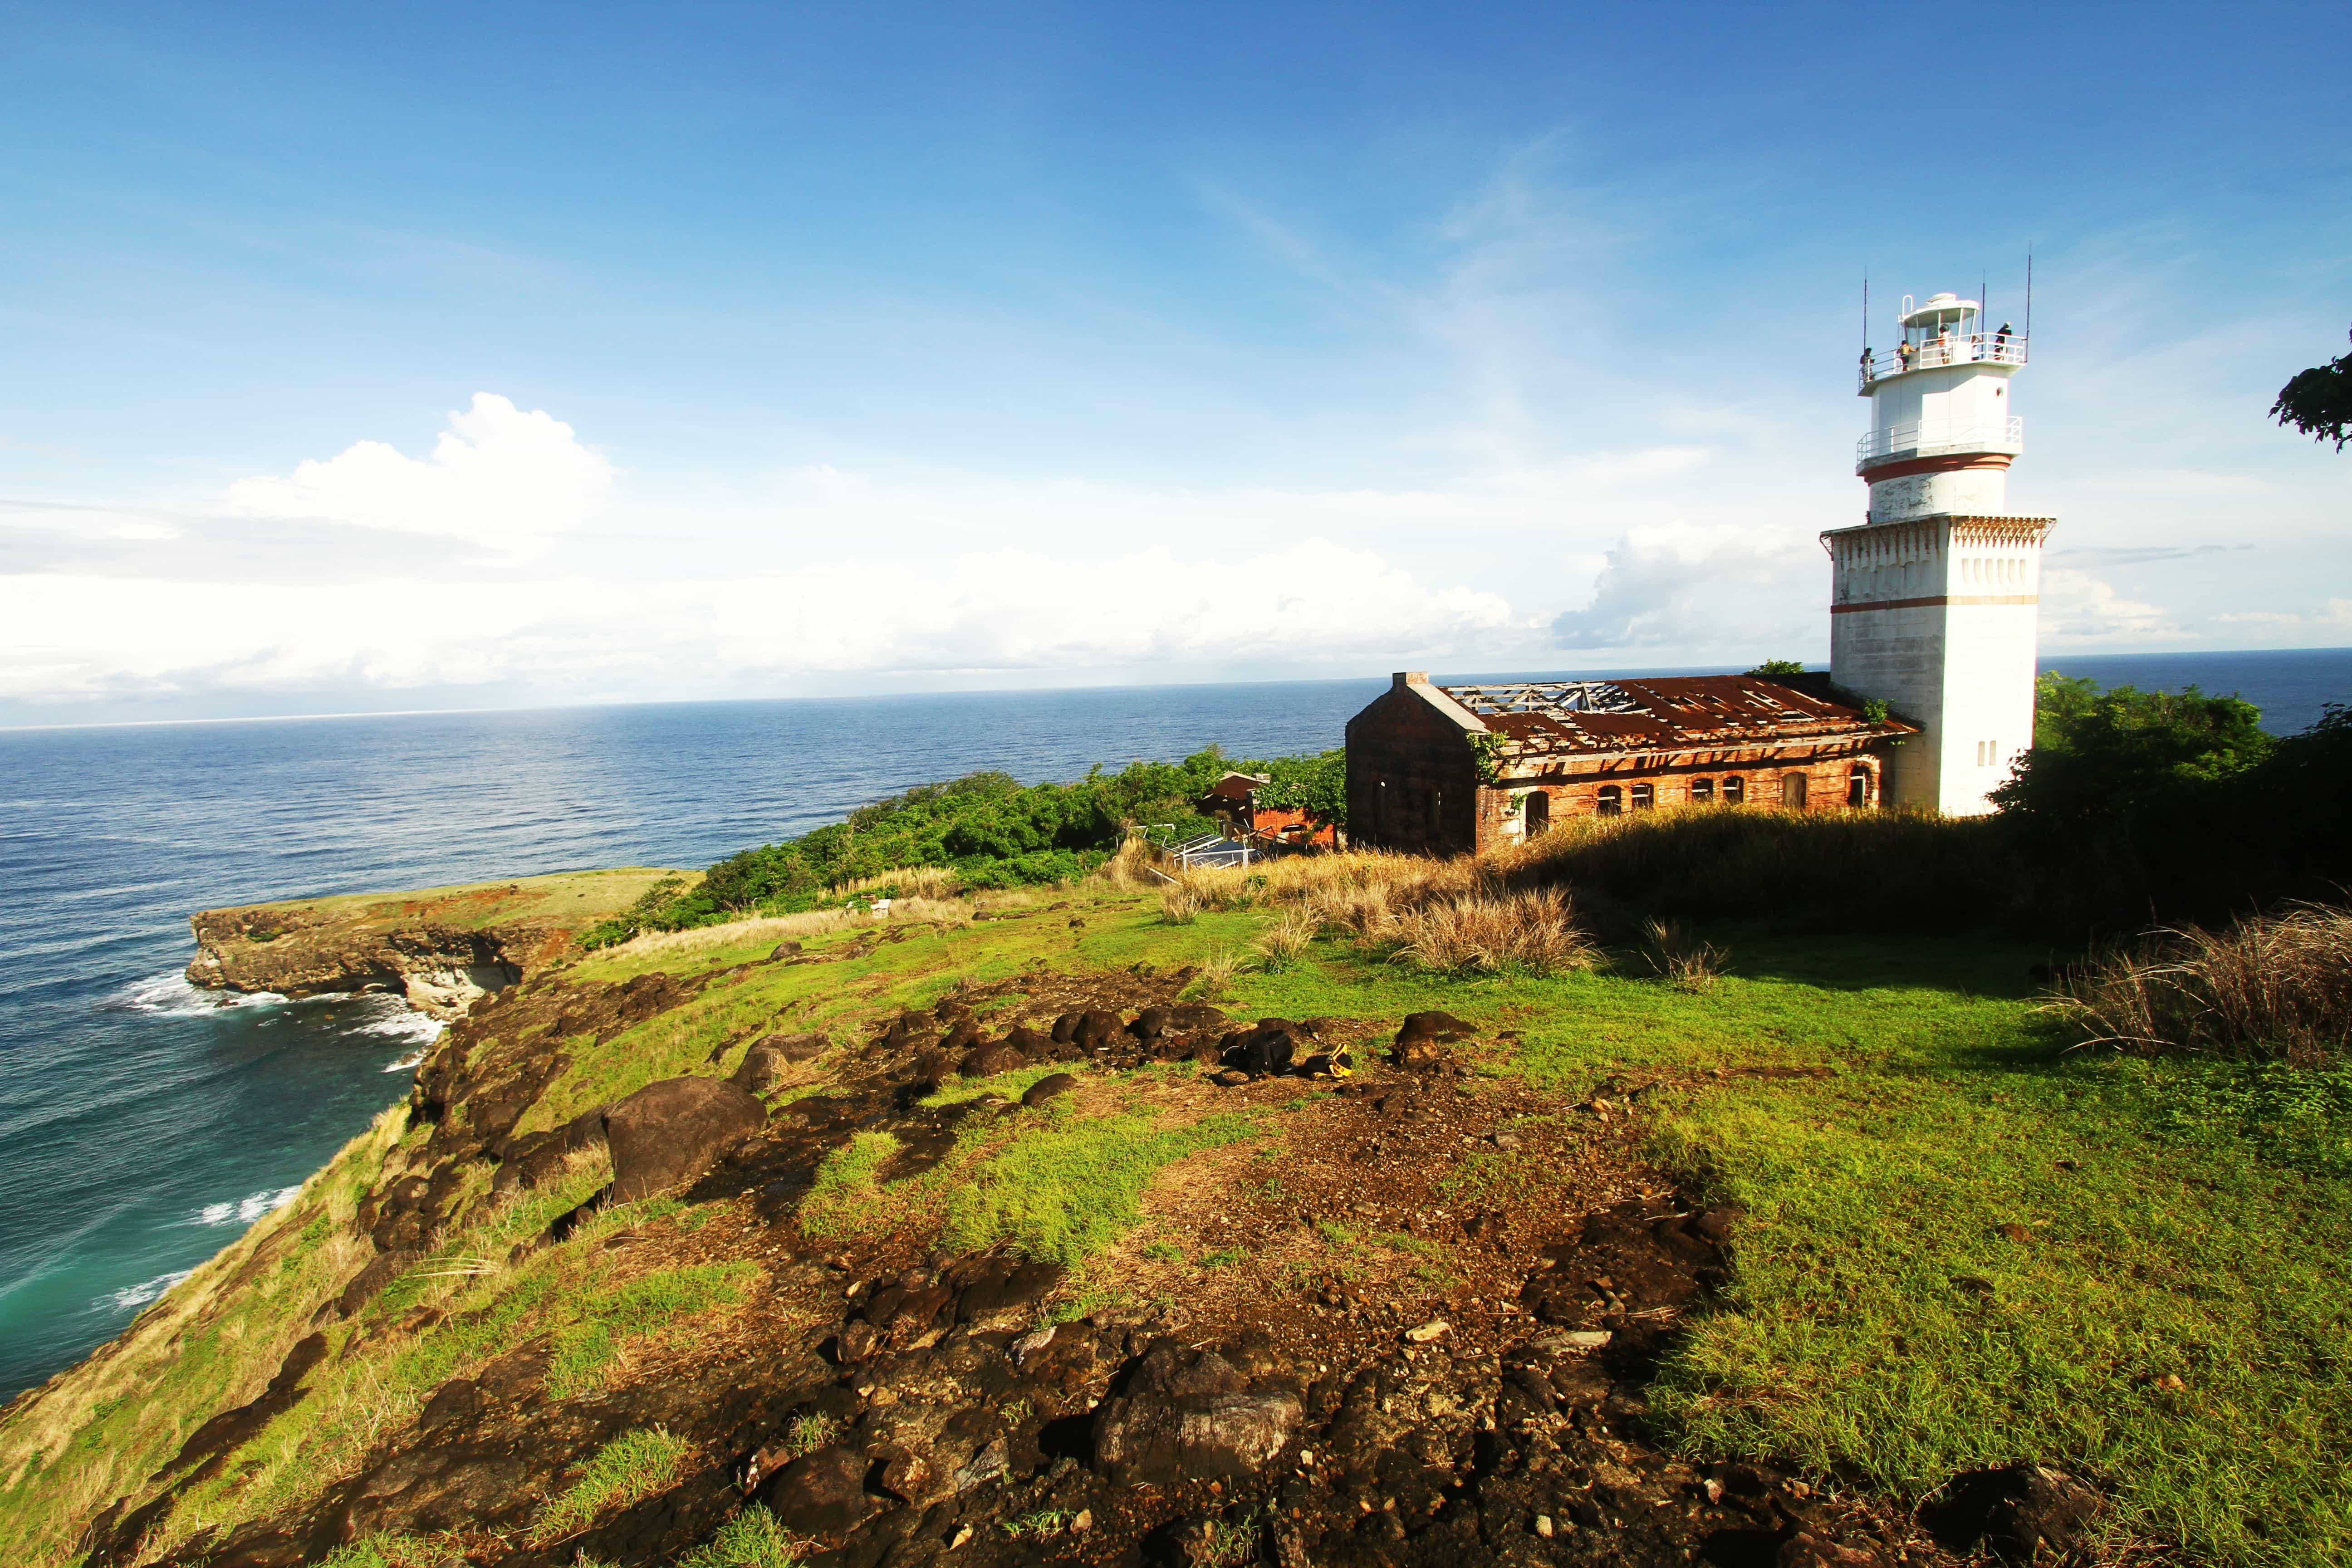 Zambales, Zambales Tourist spots, Things to do in Zambales, Capones Lighthouse